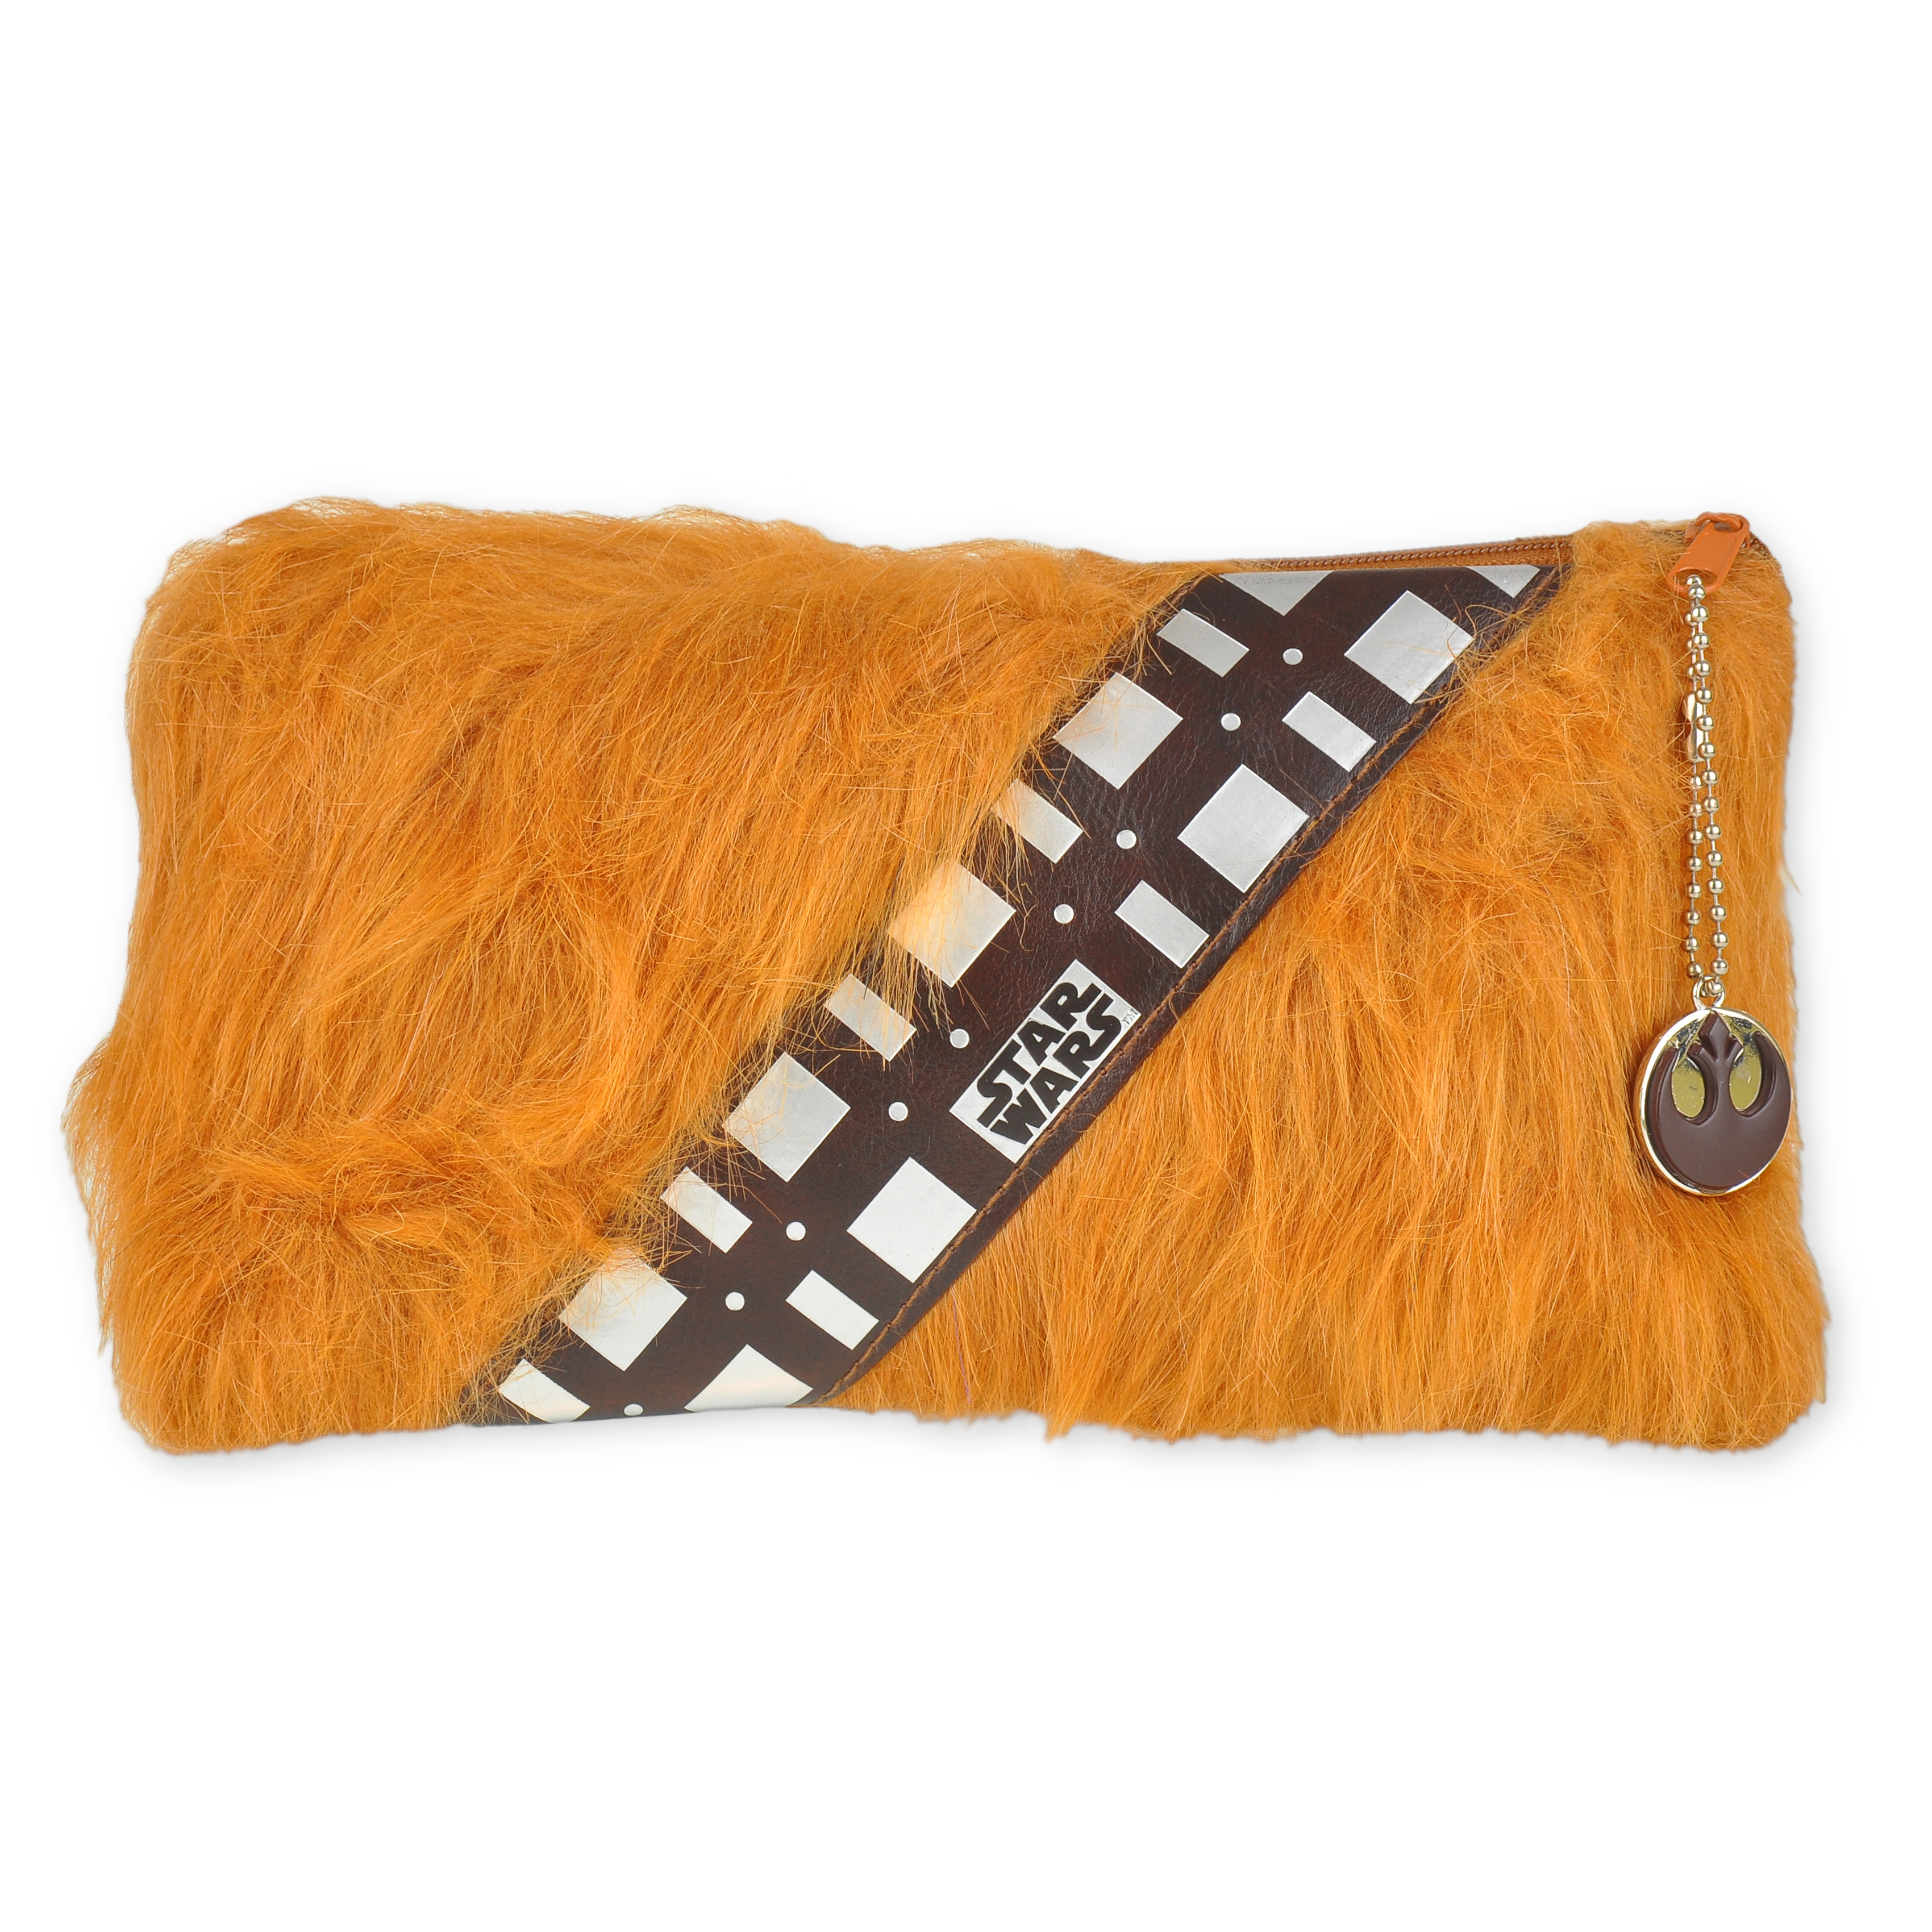 Penál Star Wars - Chewbacca